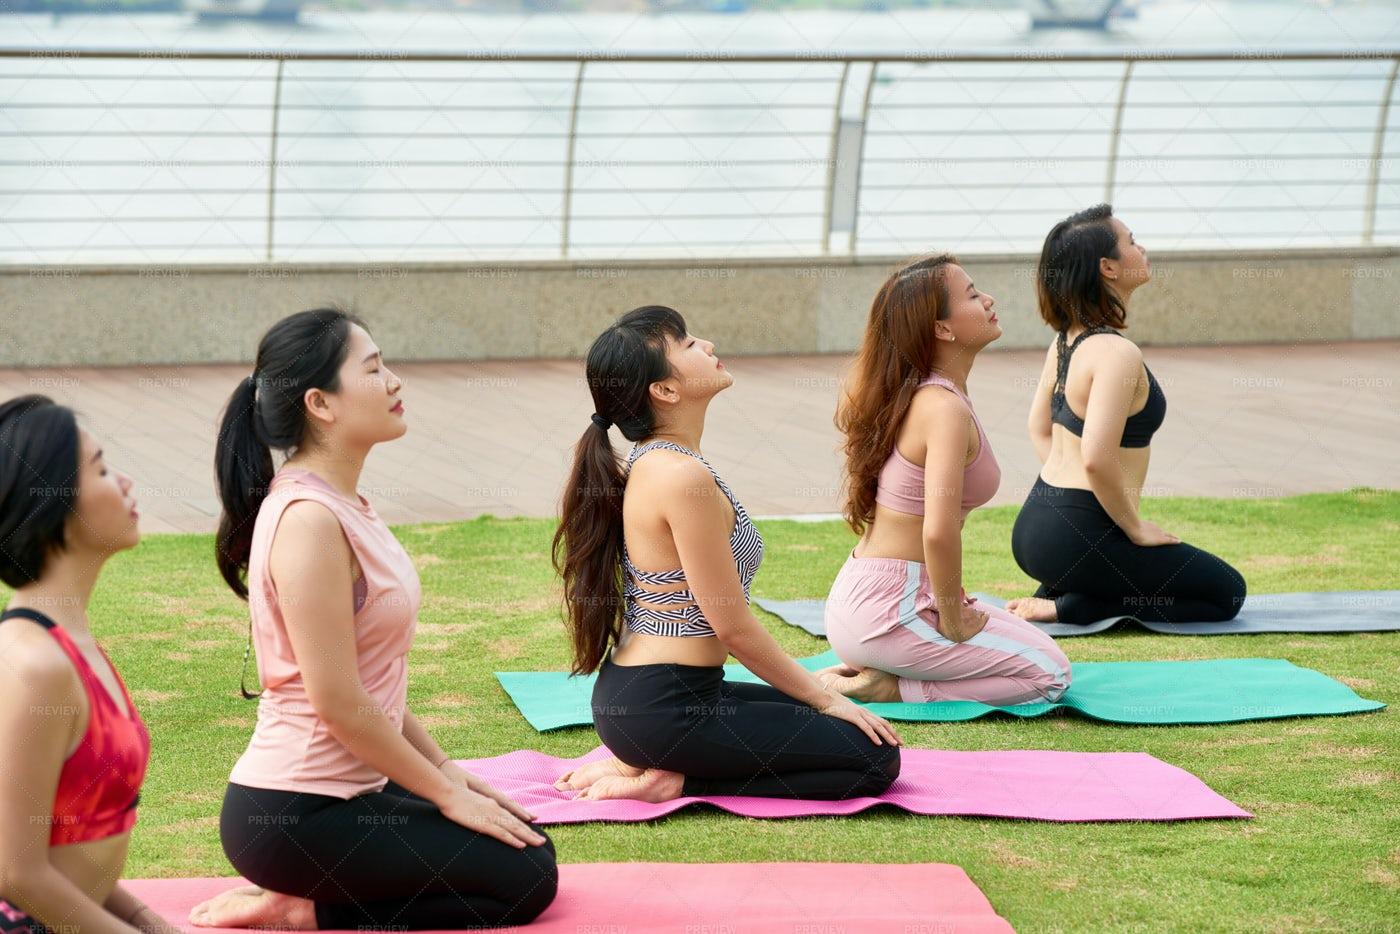 Meditating Ethnic Women In Row Outdoors: Stock Photos